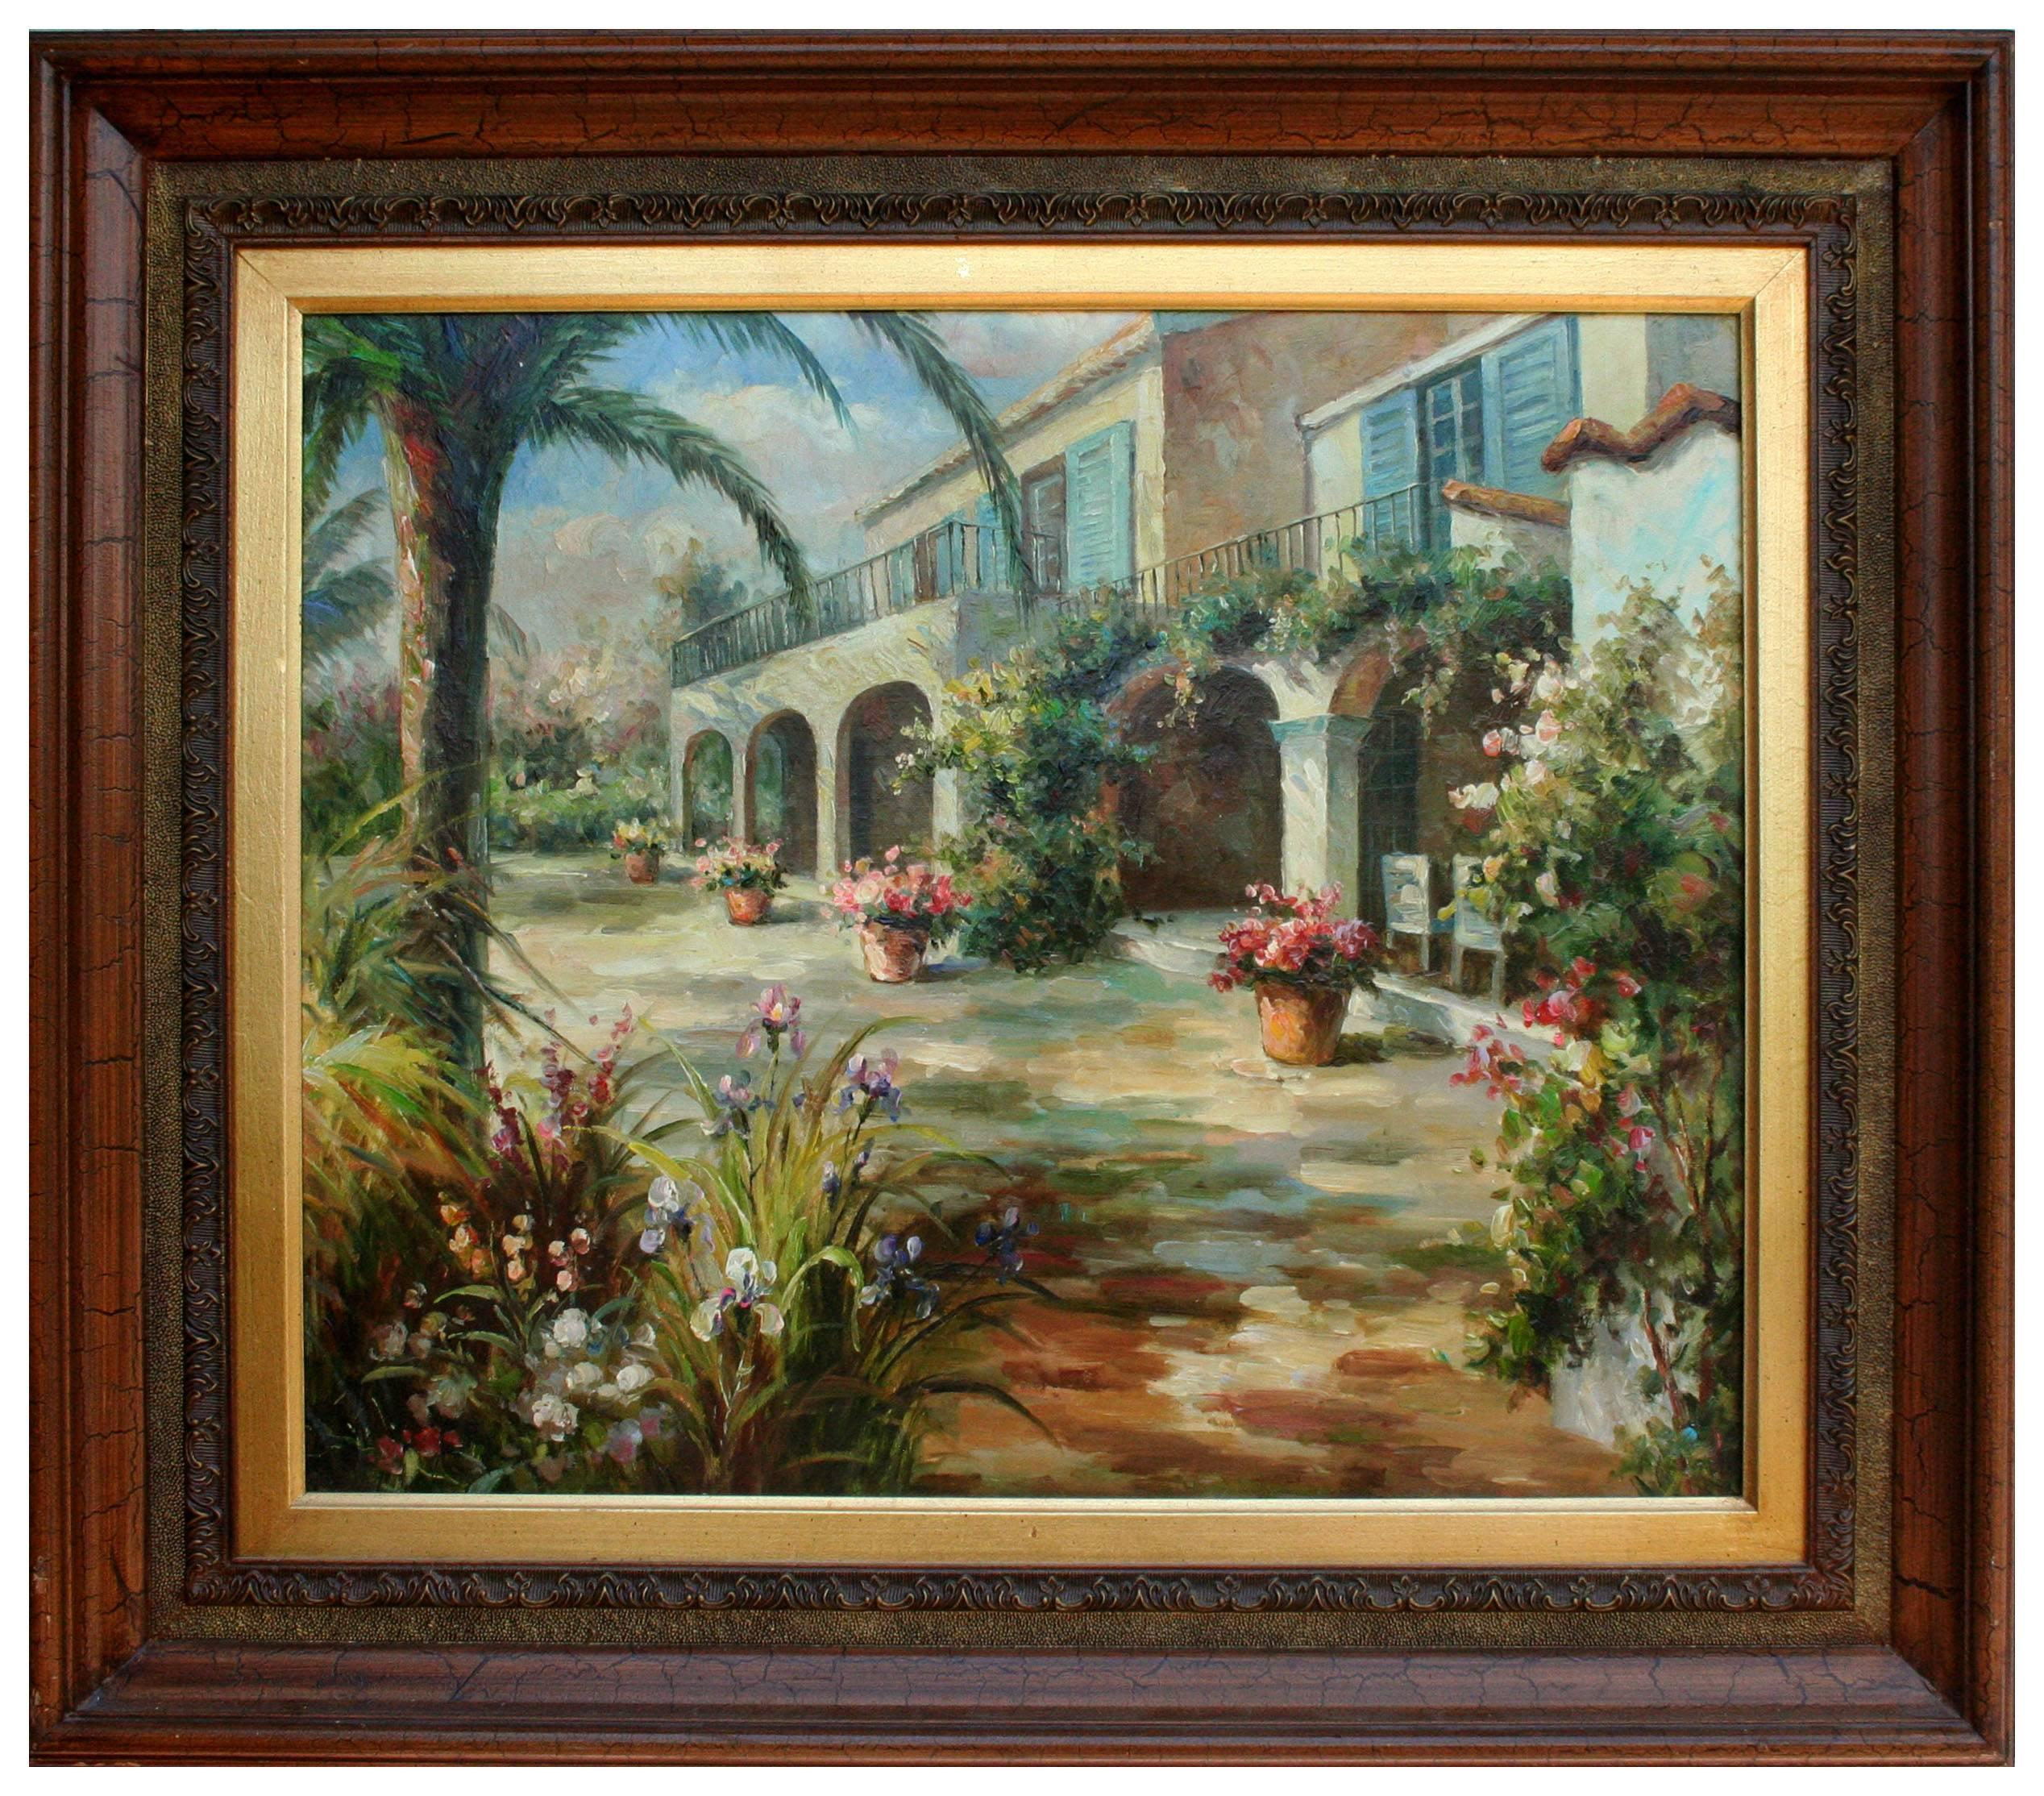 Palm Beach Home Garden Landscape